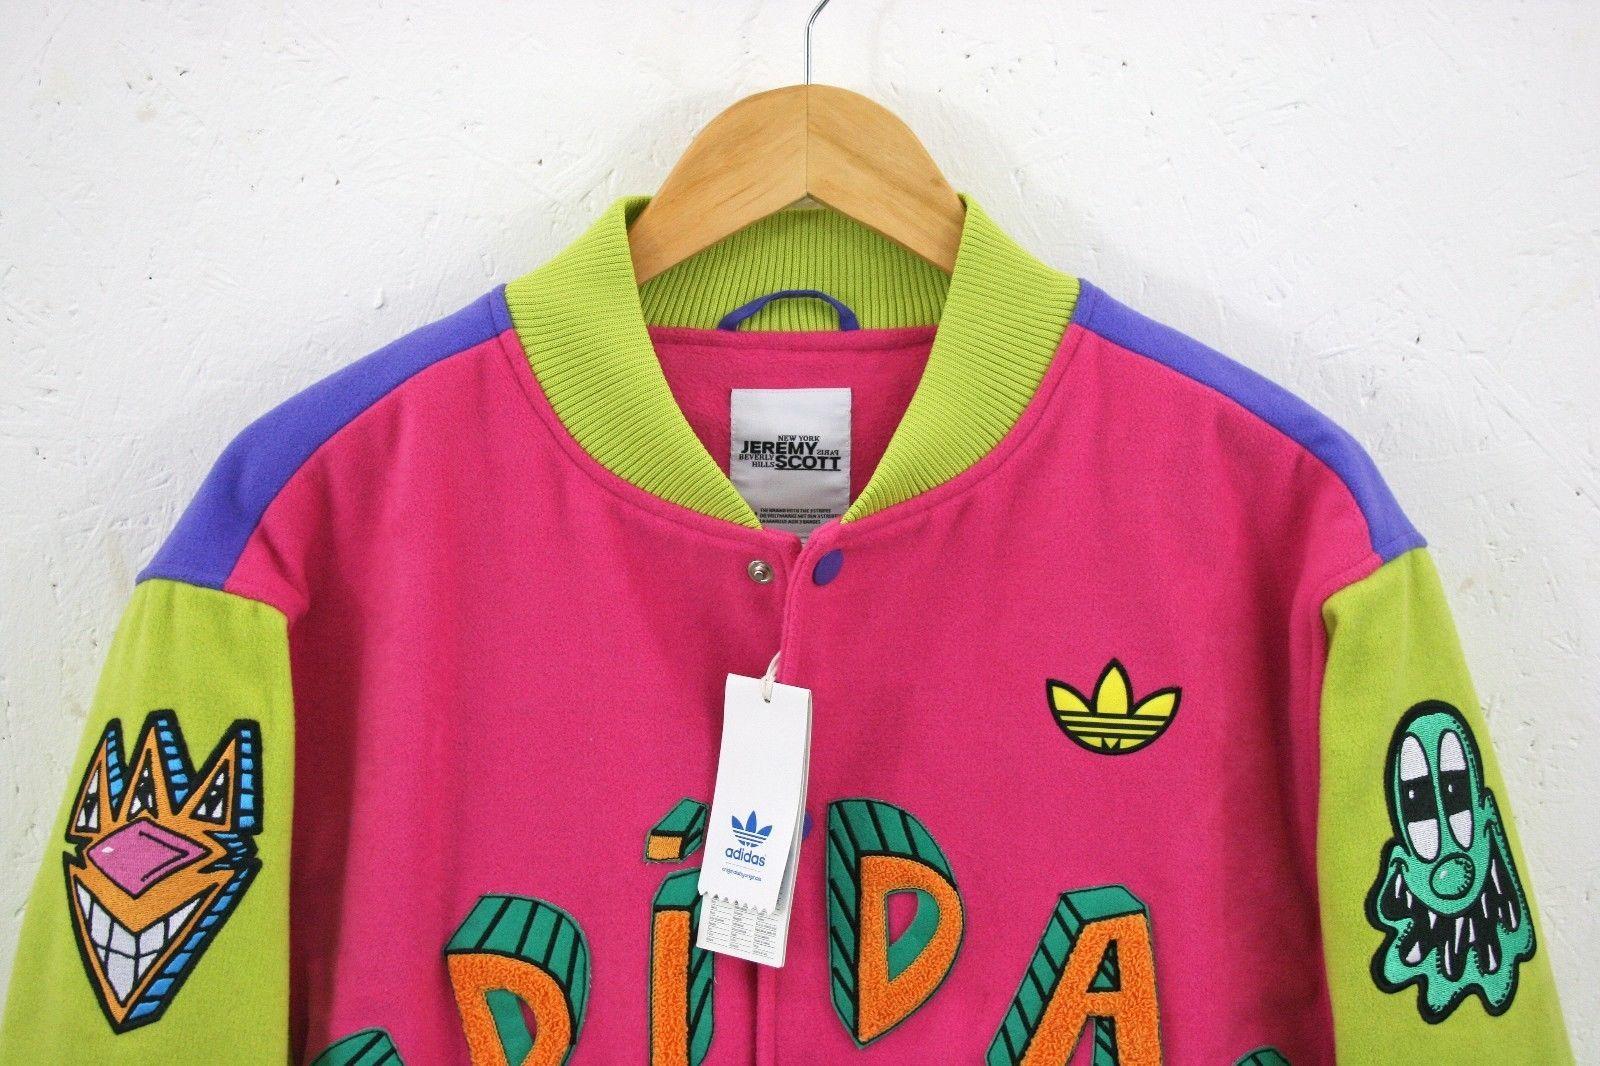 NEW Adidas x Jeremy Scott x Kenny Scharf mens KS VARSity JACKET Size S  Authentic  7326cff0604